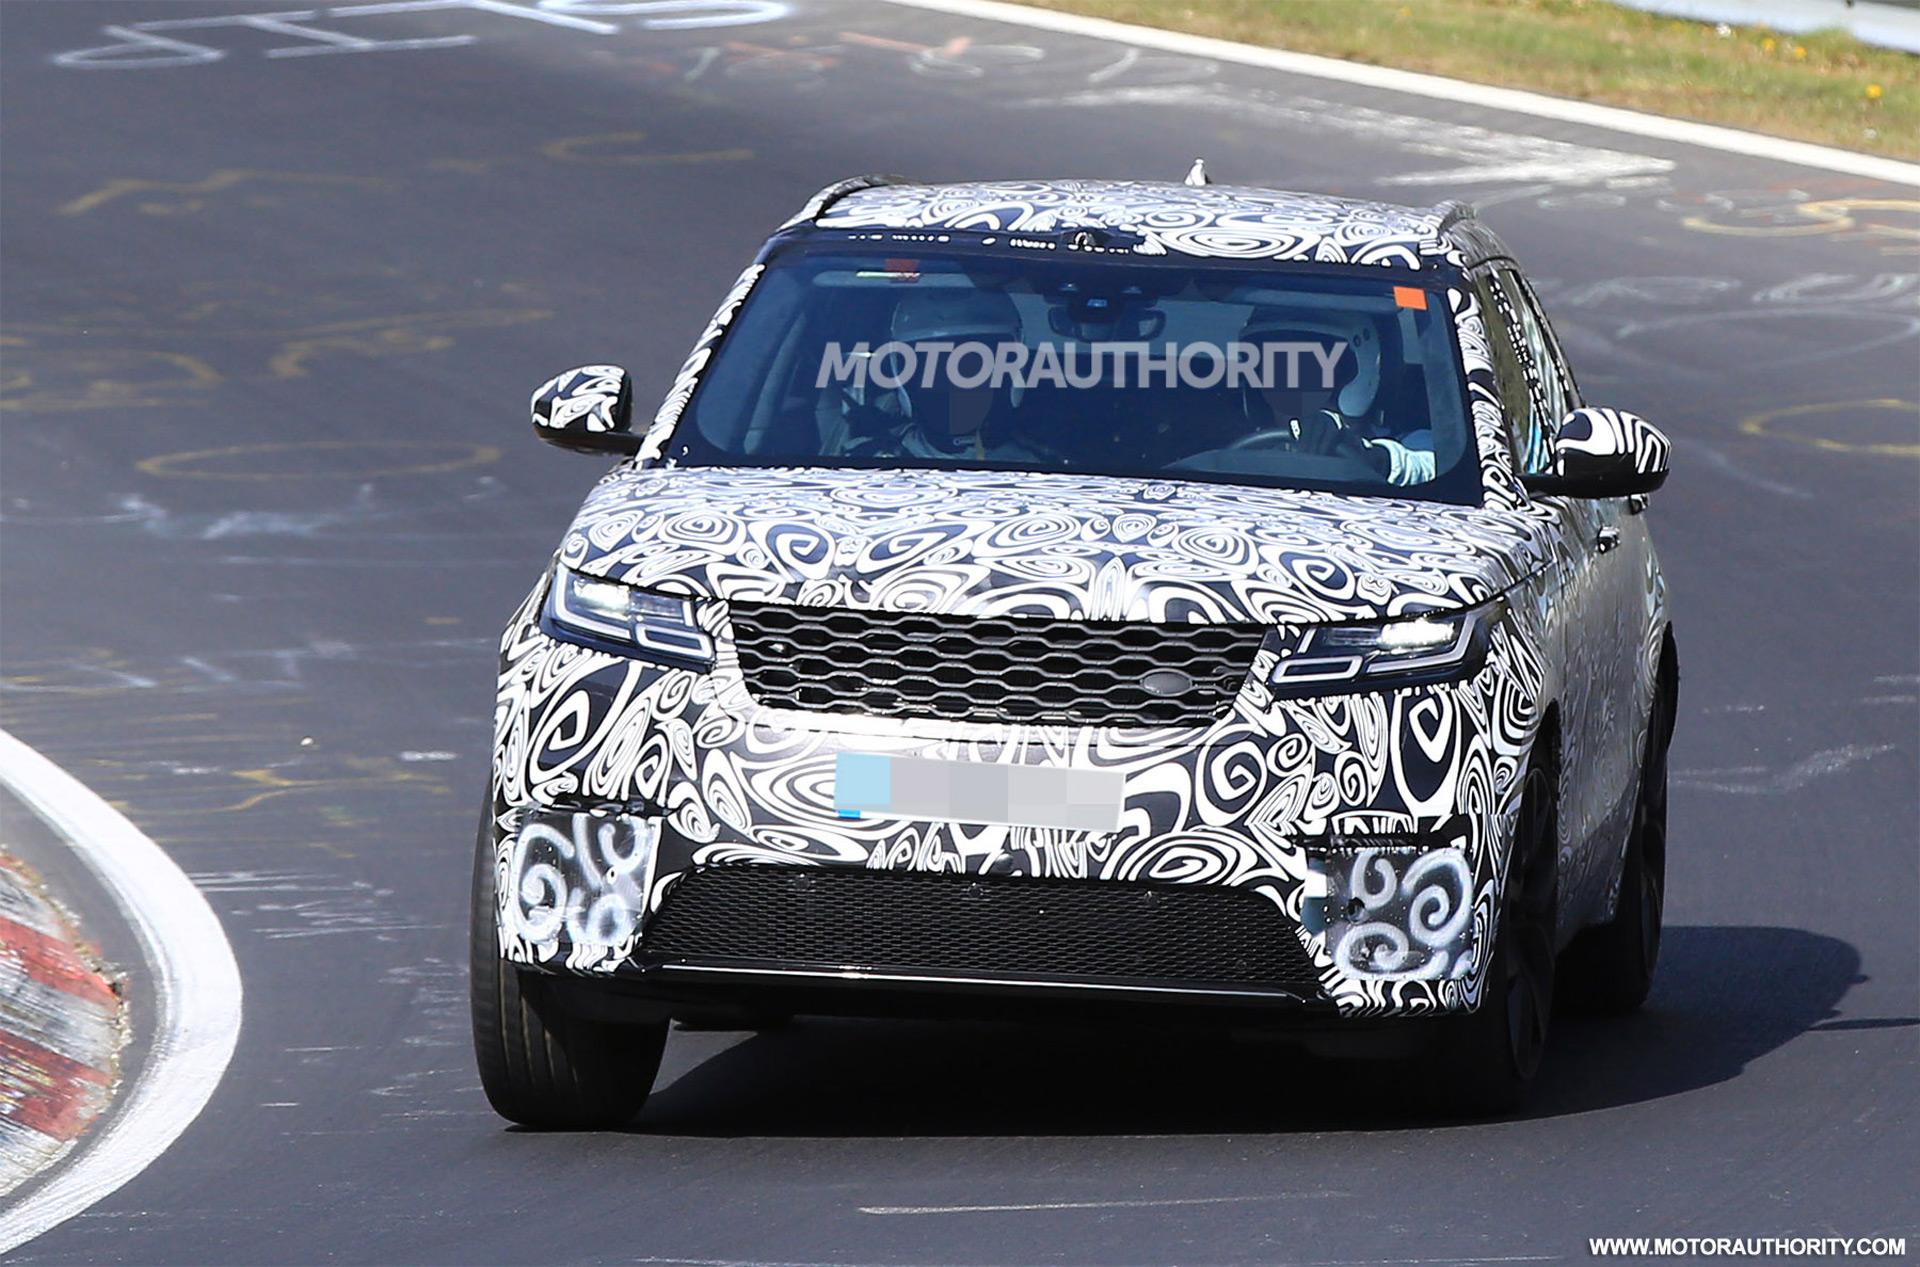 2019 Land Rover Range Rover Velar Svr Spy Shots And Video